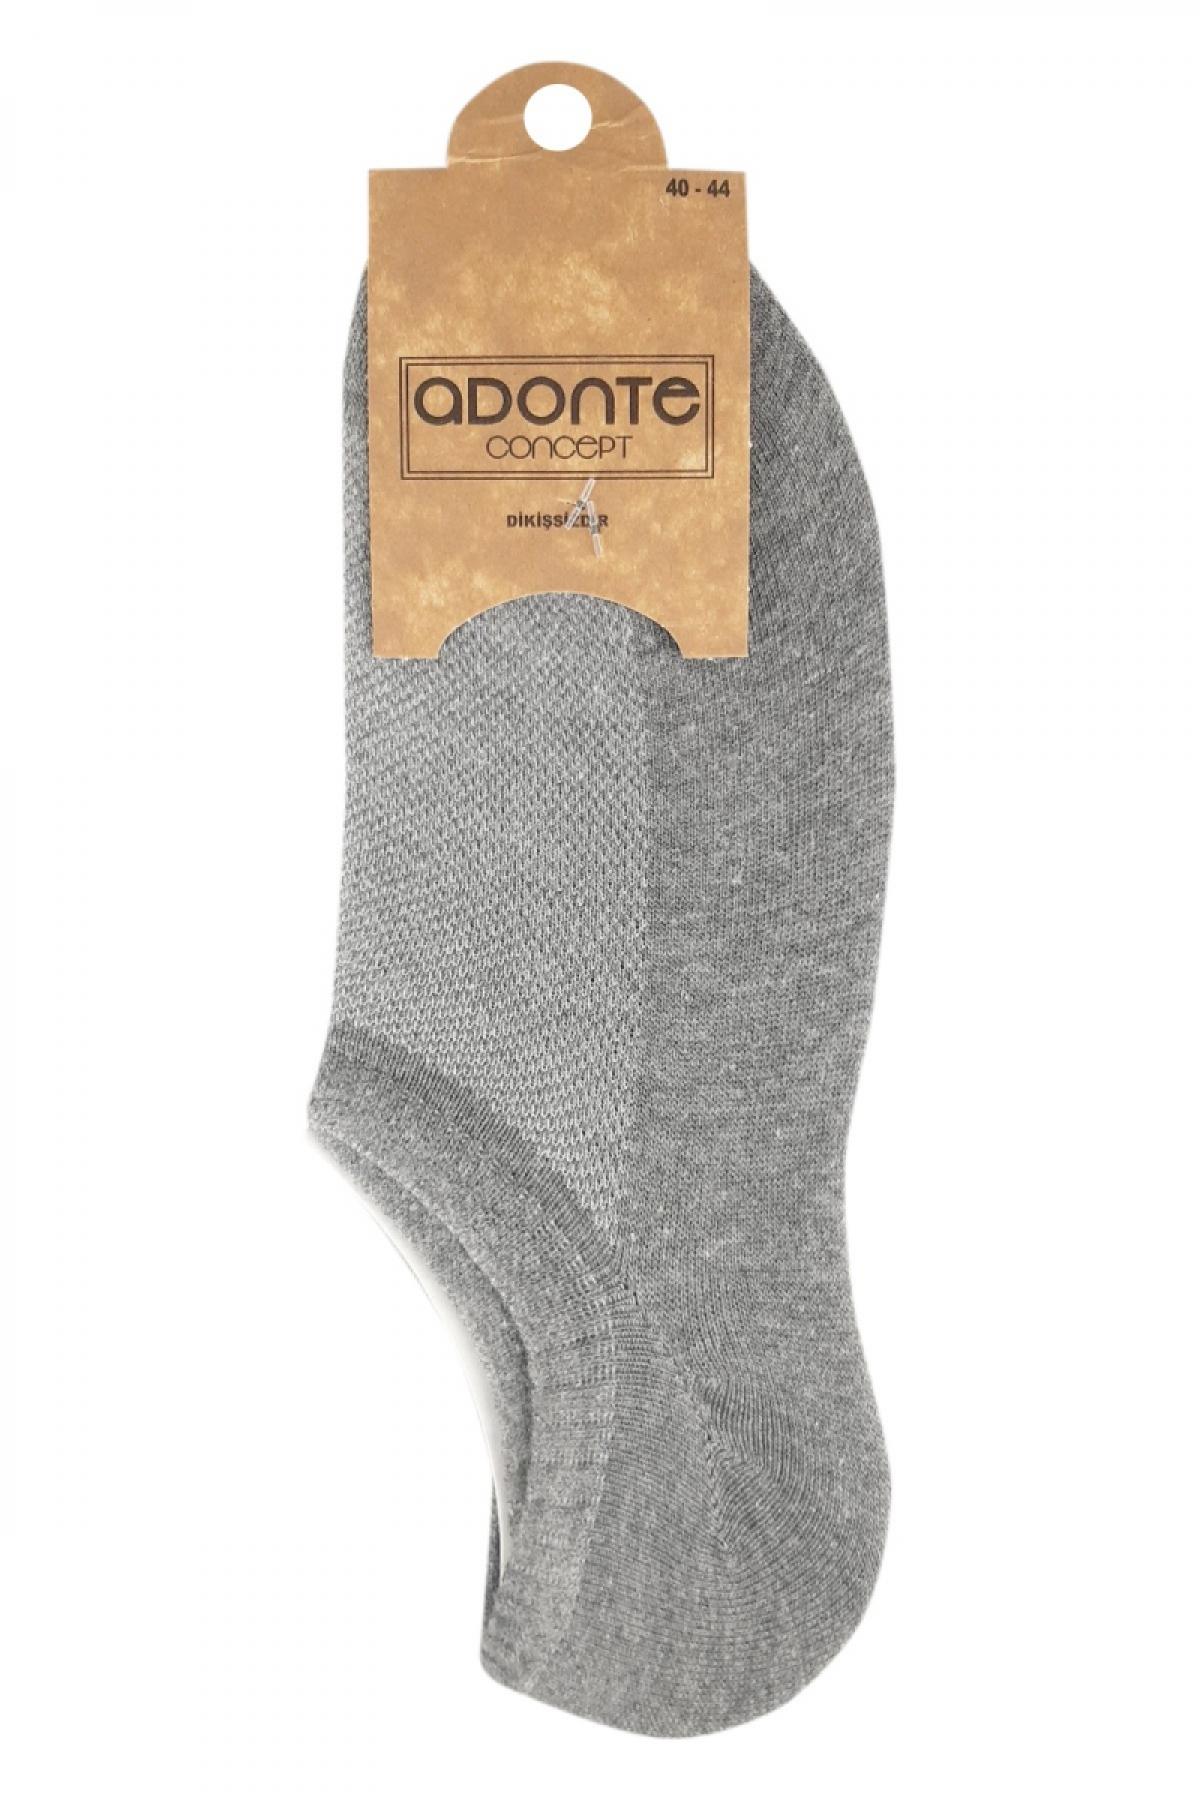 Adonte Erkek Sneaker Düz Çorap - Thumbnail